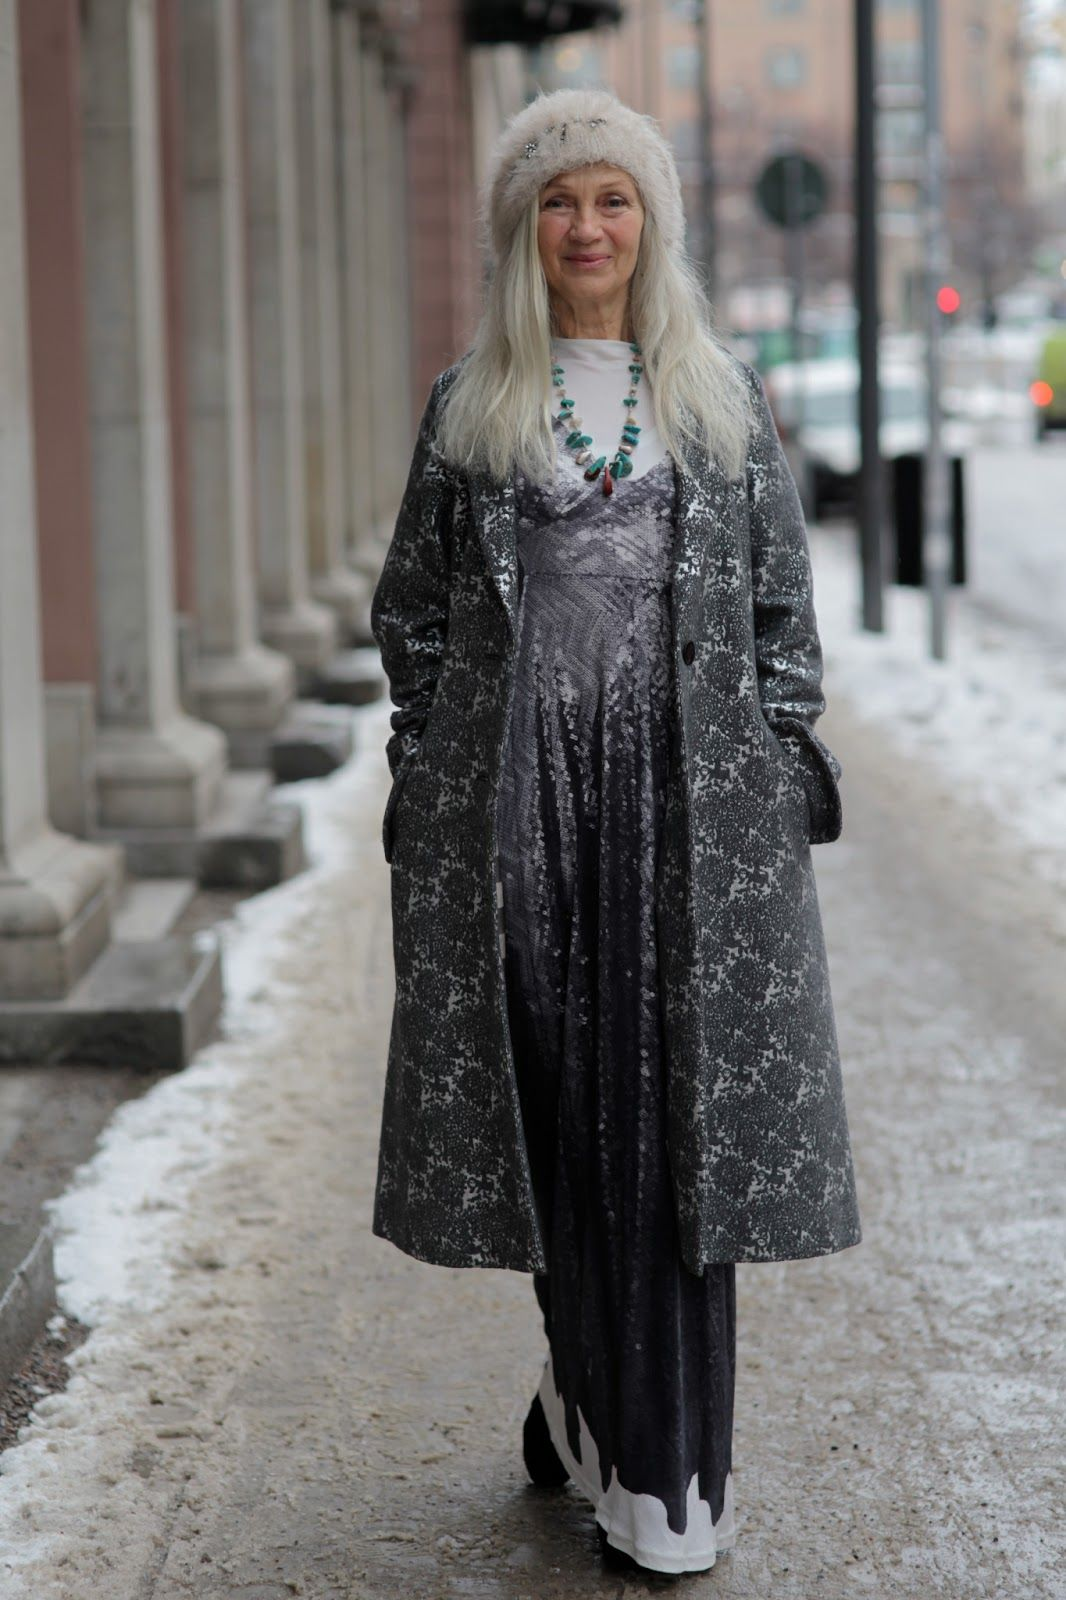 Ingmari Lamy- still modeling ay 65! Being in the world of ...